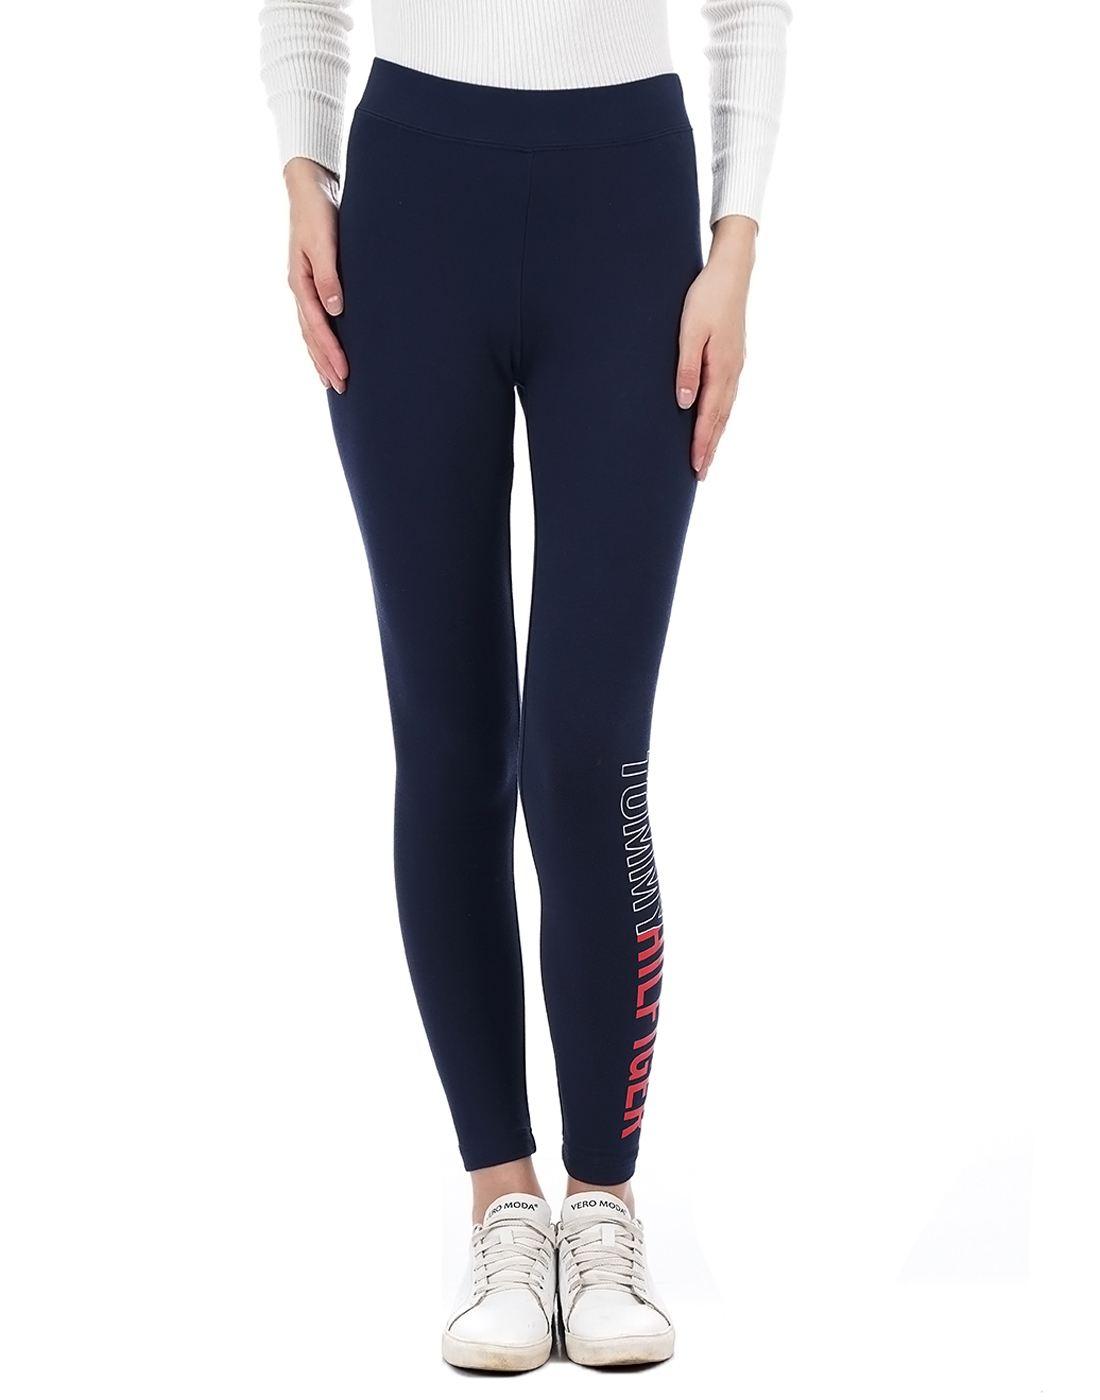 Tommy Hilfiger Women Navy Legging